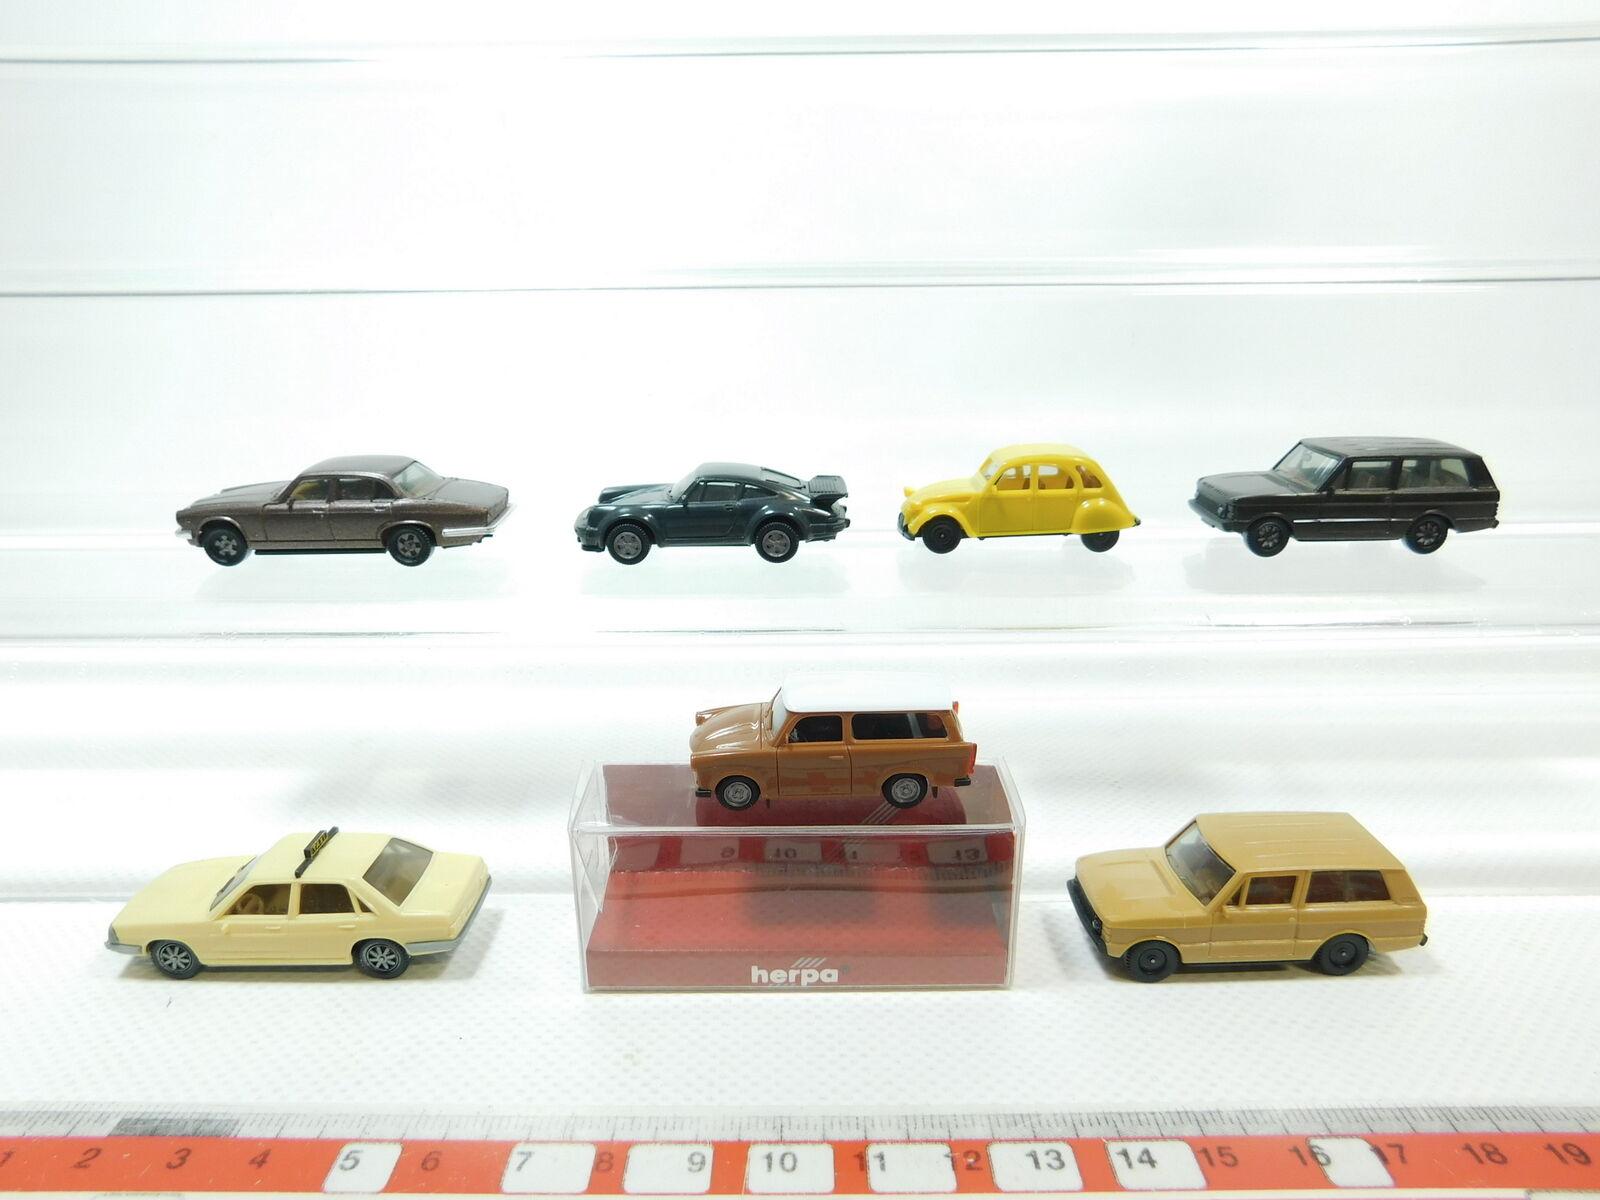 Bh68-0,5 x HERPA H0 1 87 AUTOVETTURA  RANGE ROVER + Trabant + AUDI + JAGUAR+